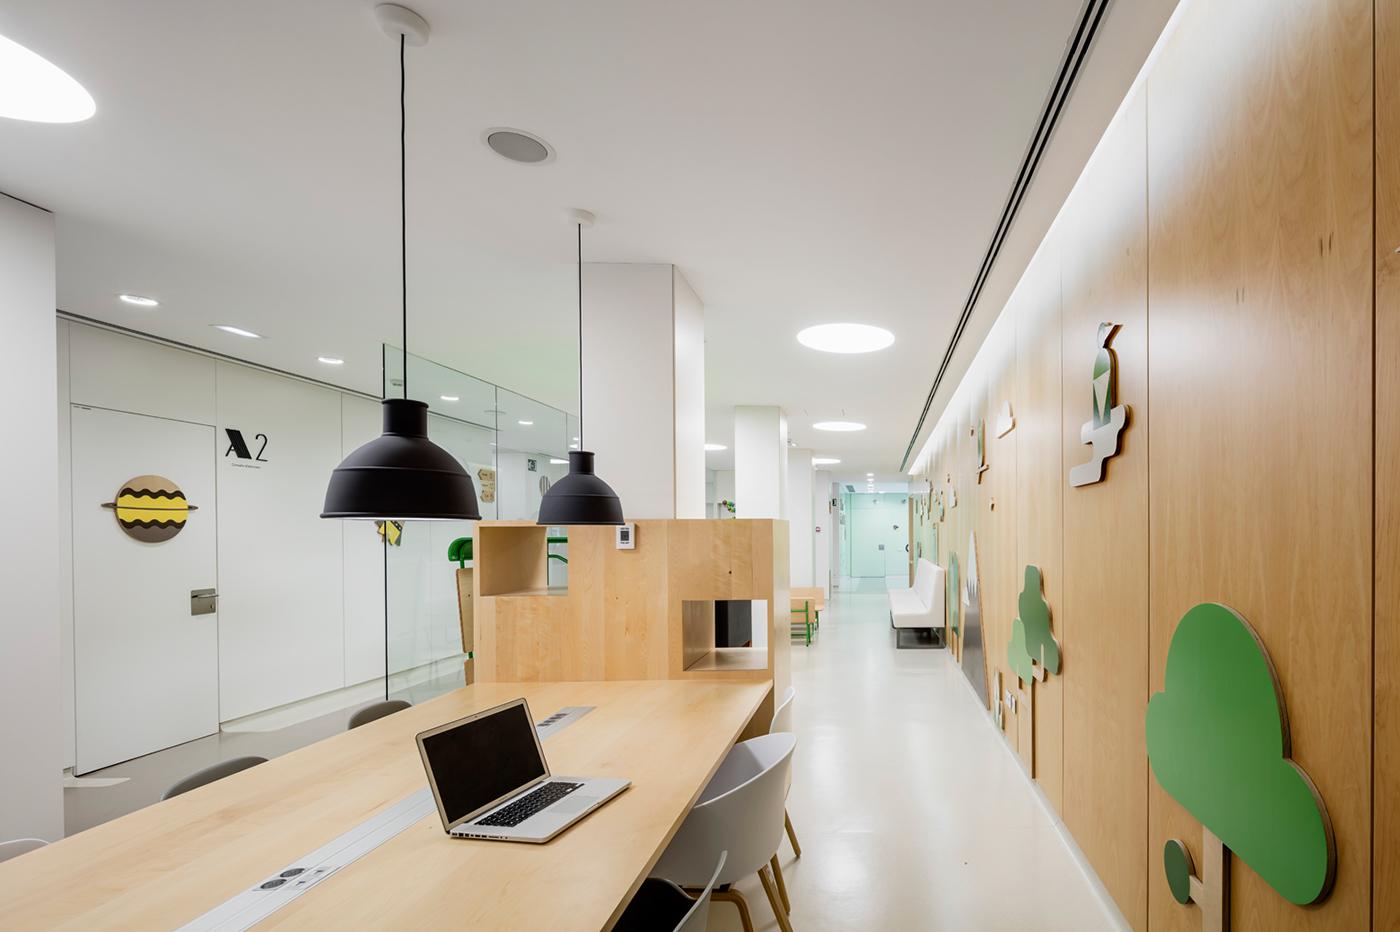 rgb_creative_ParcdAtencions_hospital_design_012